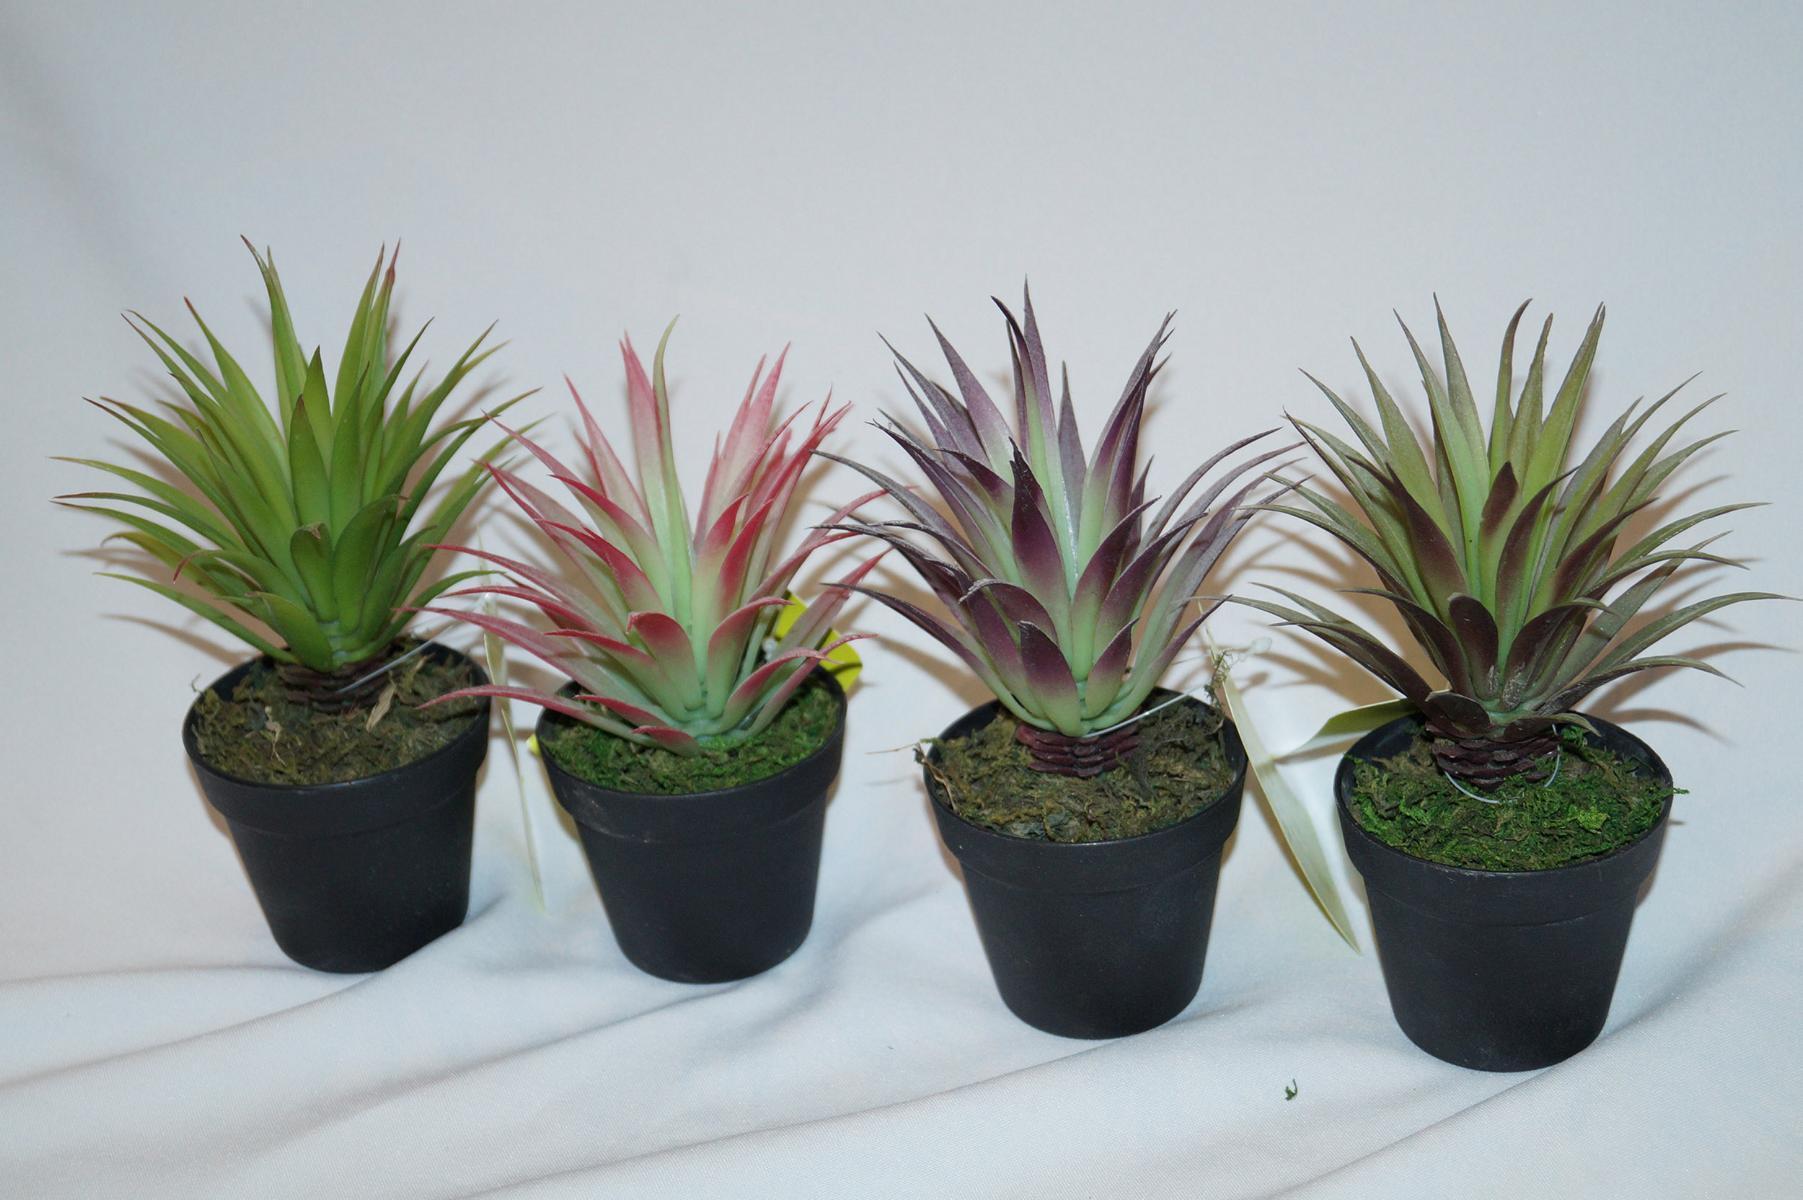 Cactus 20 cm pianta artificiale bonsai pianta grassa for Bonsai pianta